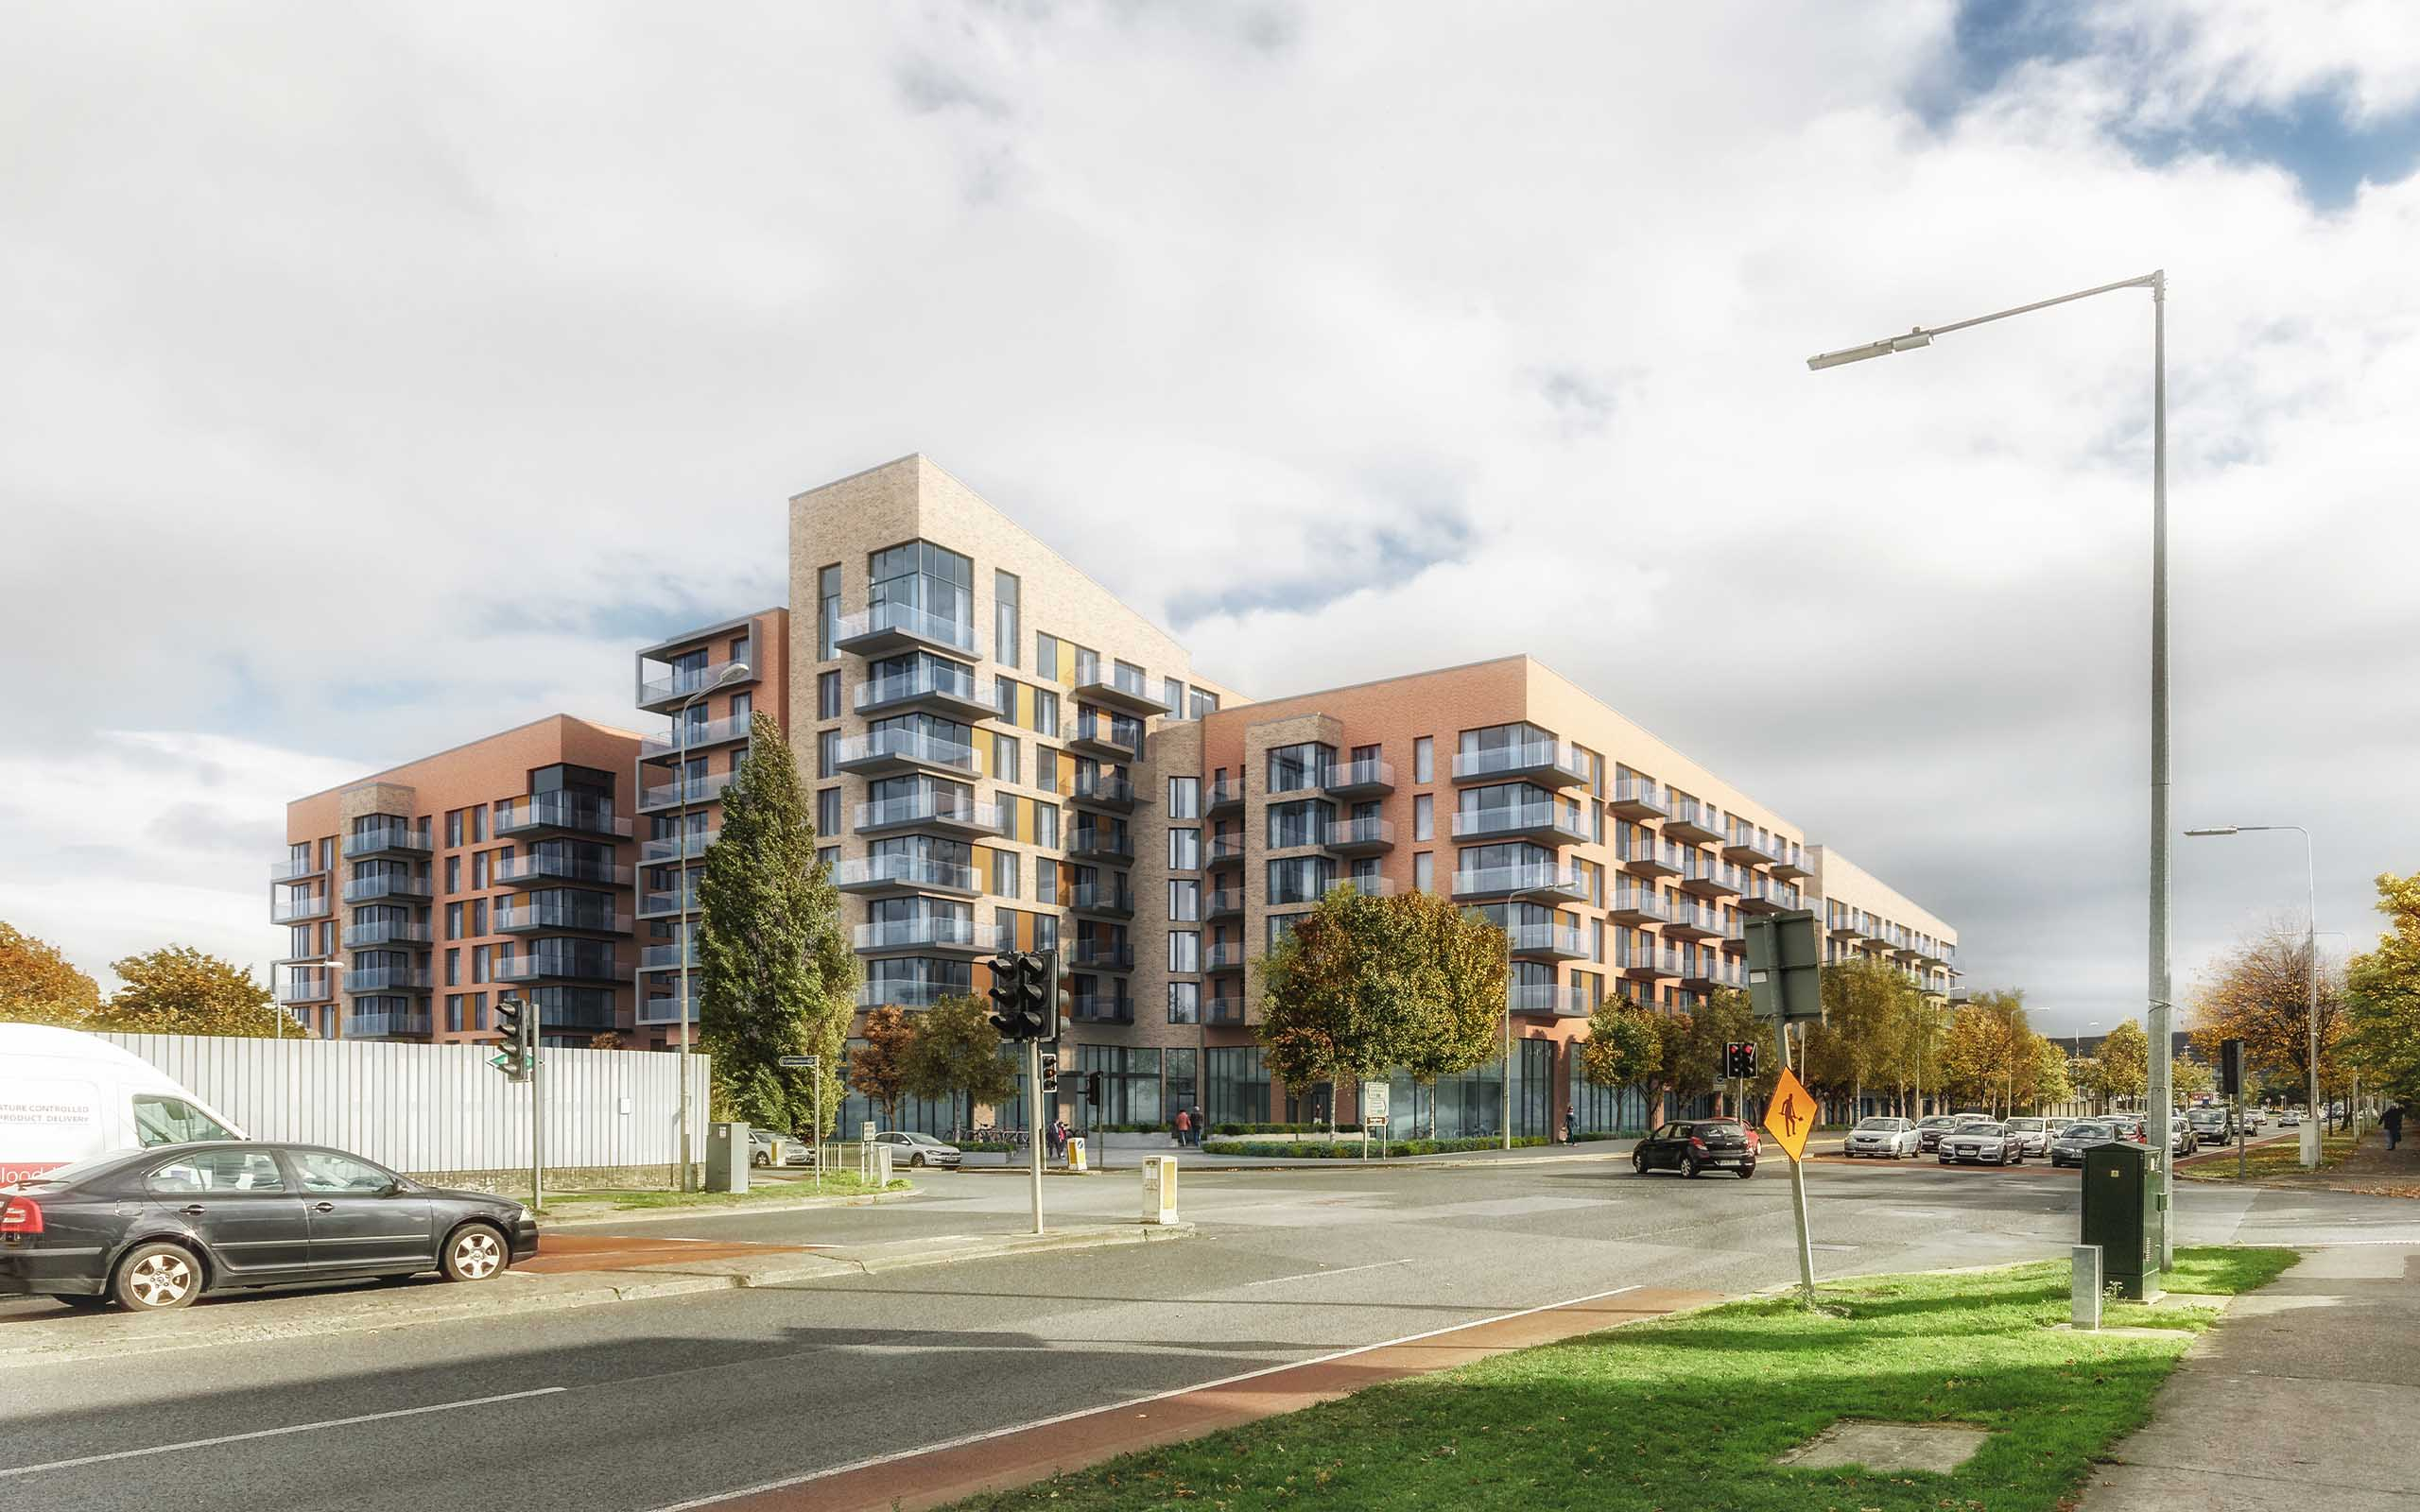 328 Units at Airton Plaza, Airton and Belgard Road, Tallaght. 3D Visualisation by 3D Design Bureau.